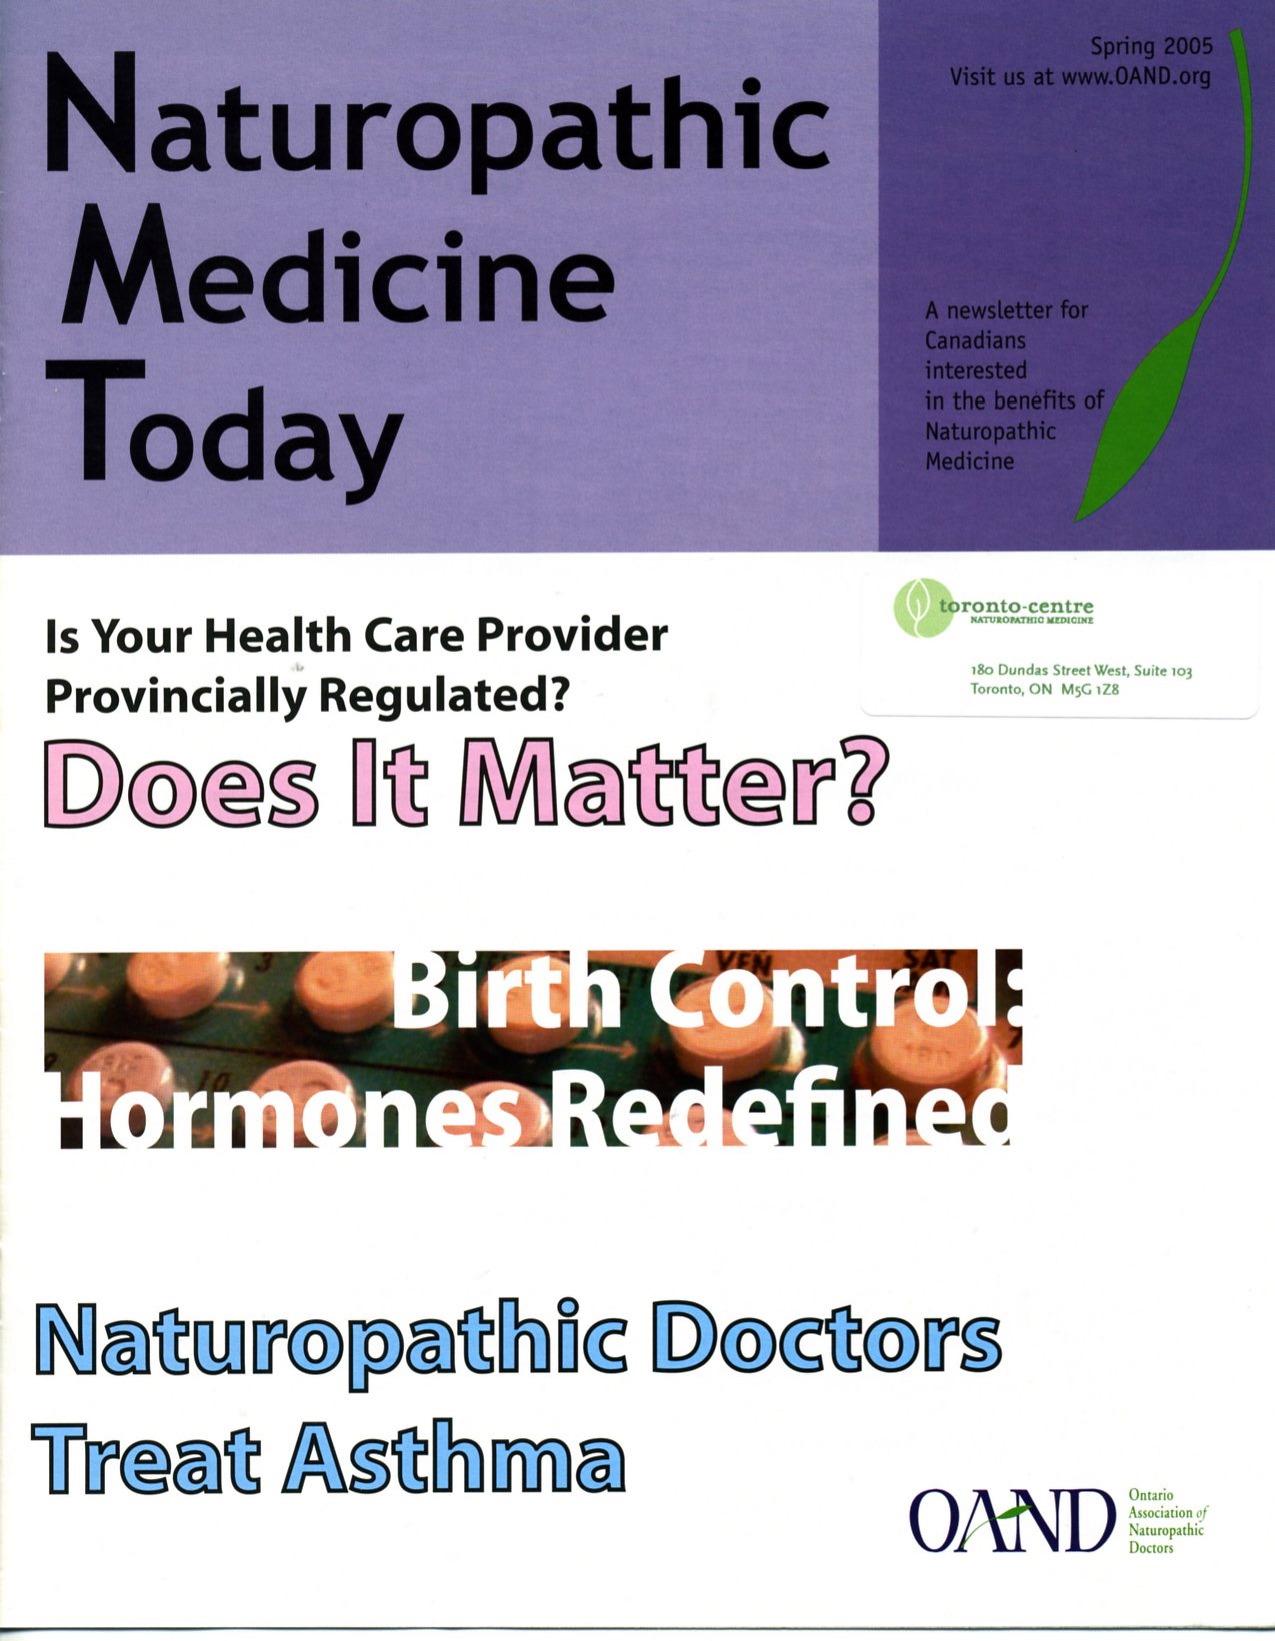 Toronto Naturopathic Doctor